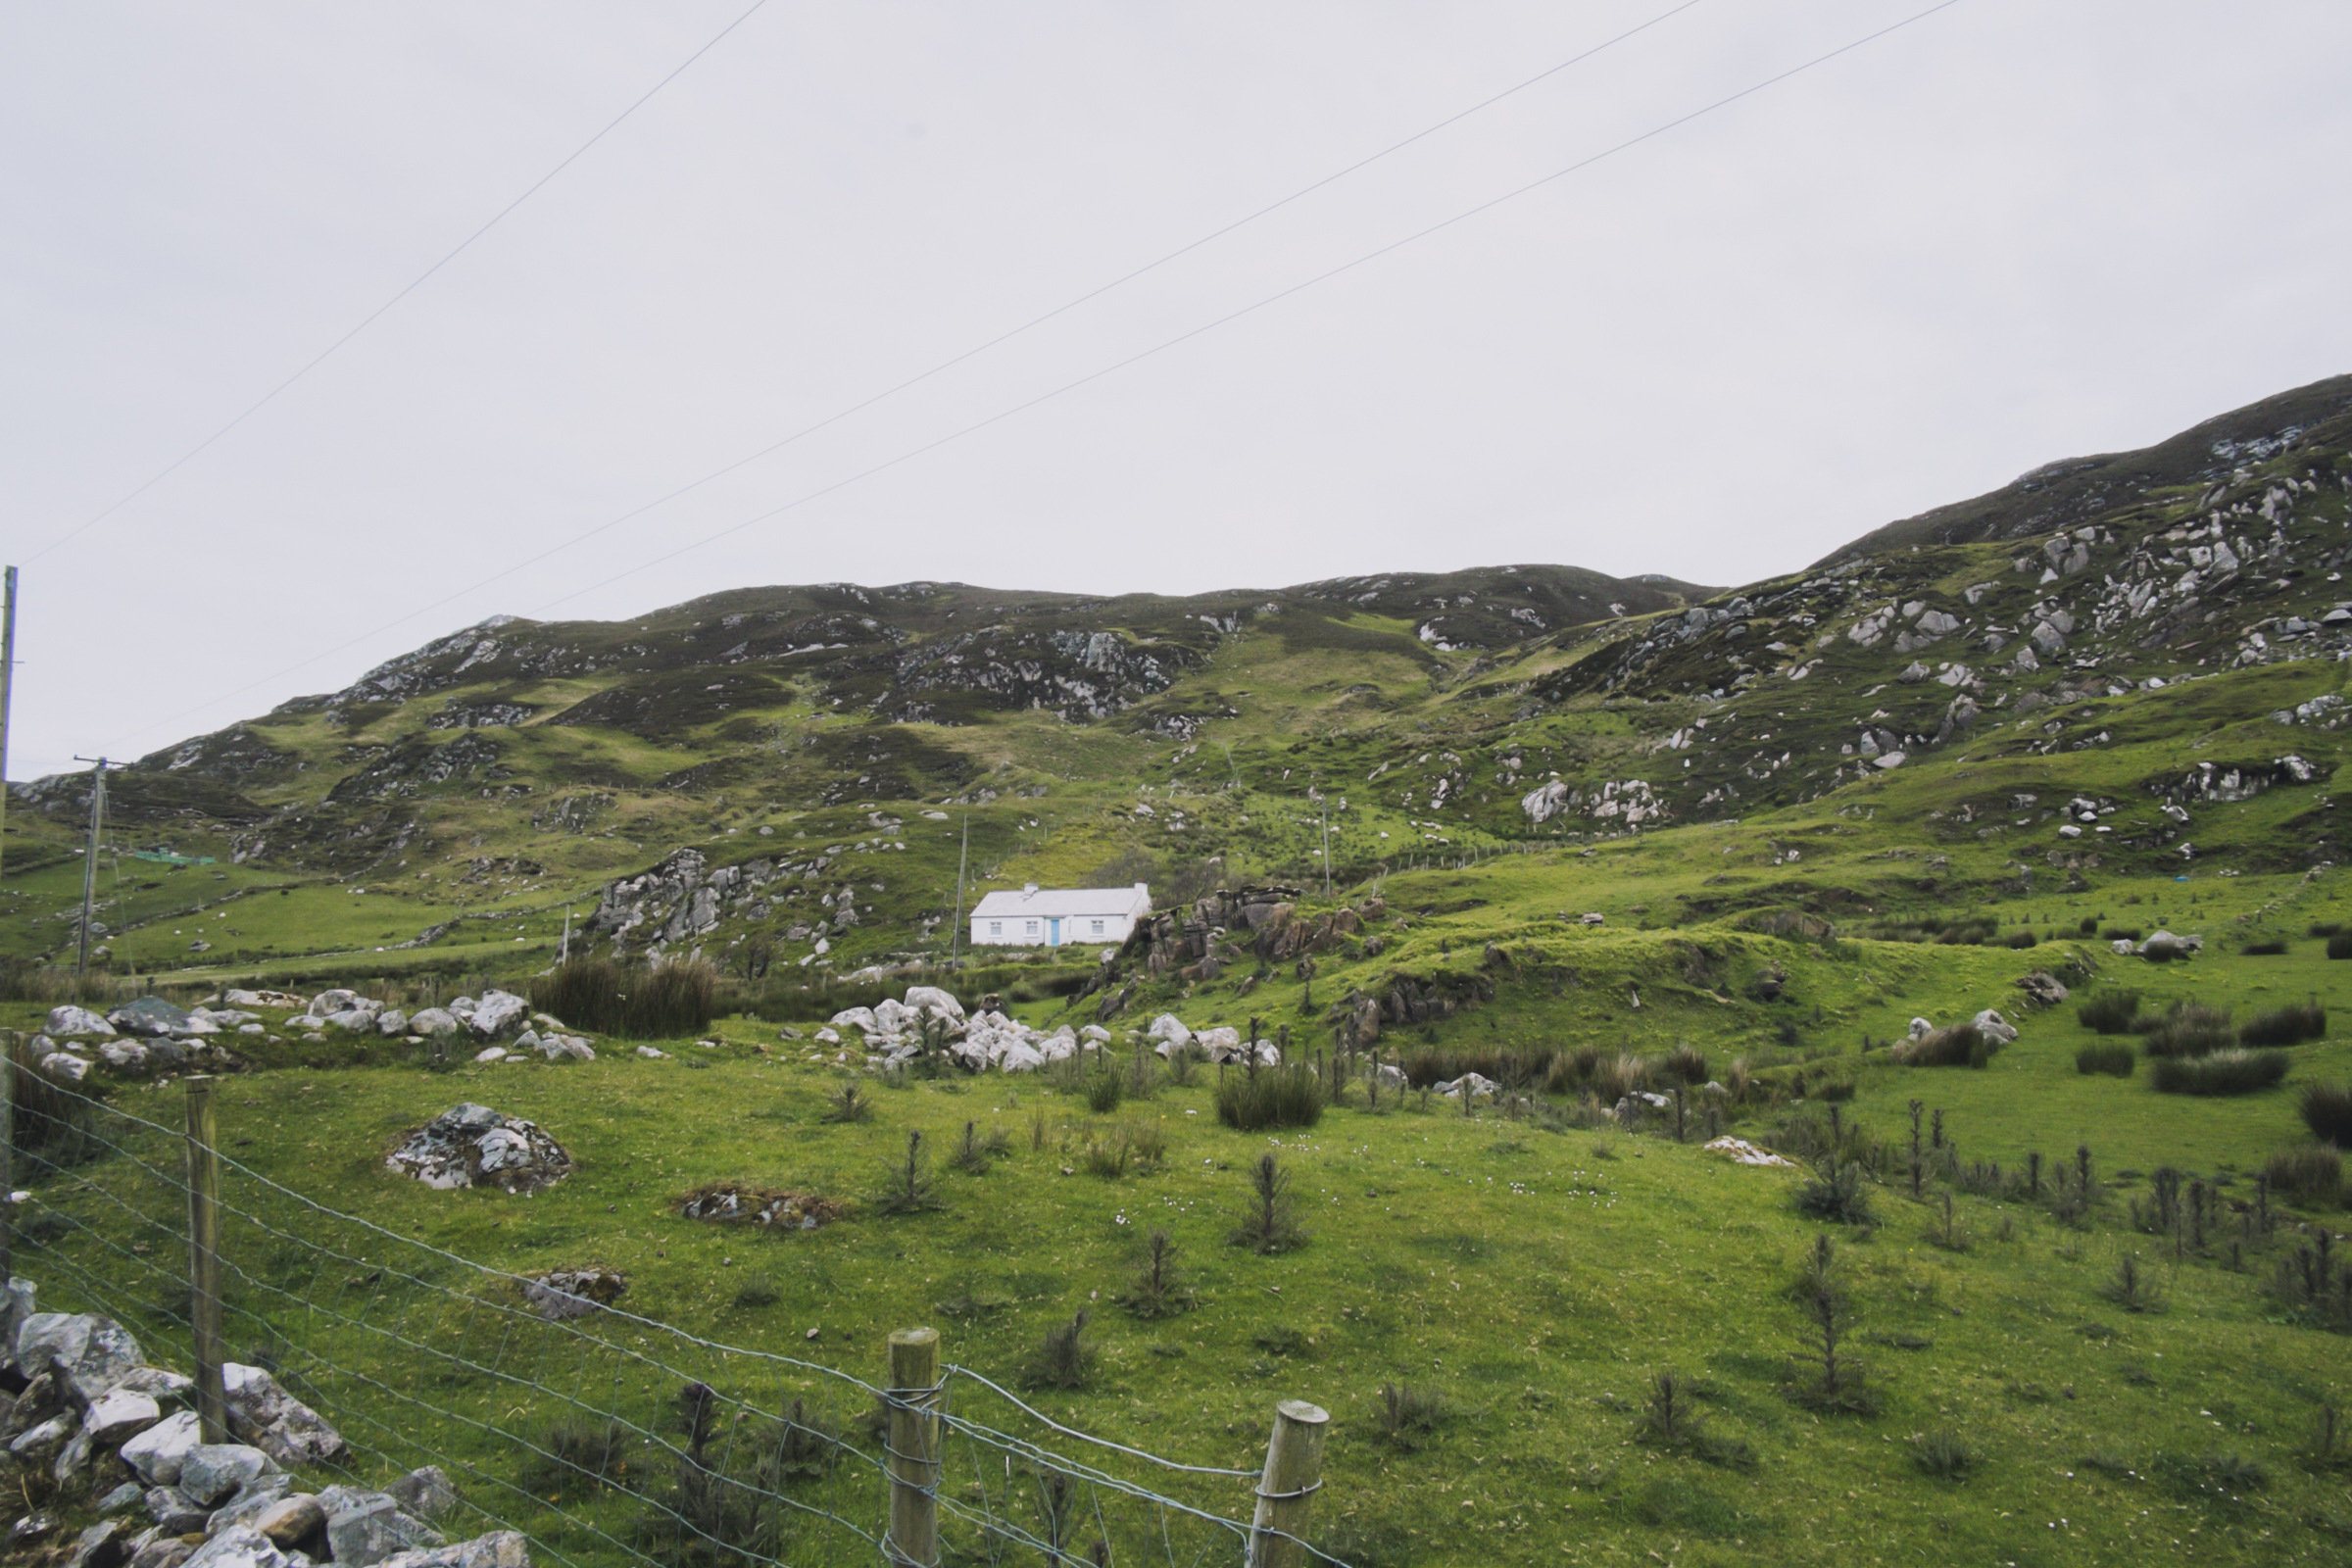 20150615-054-Ireland_Travel_Editorial.jpg